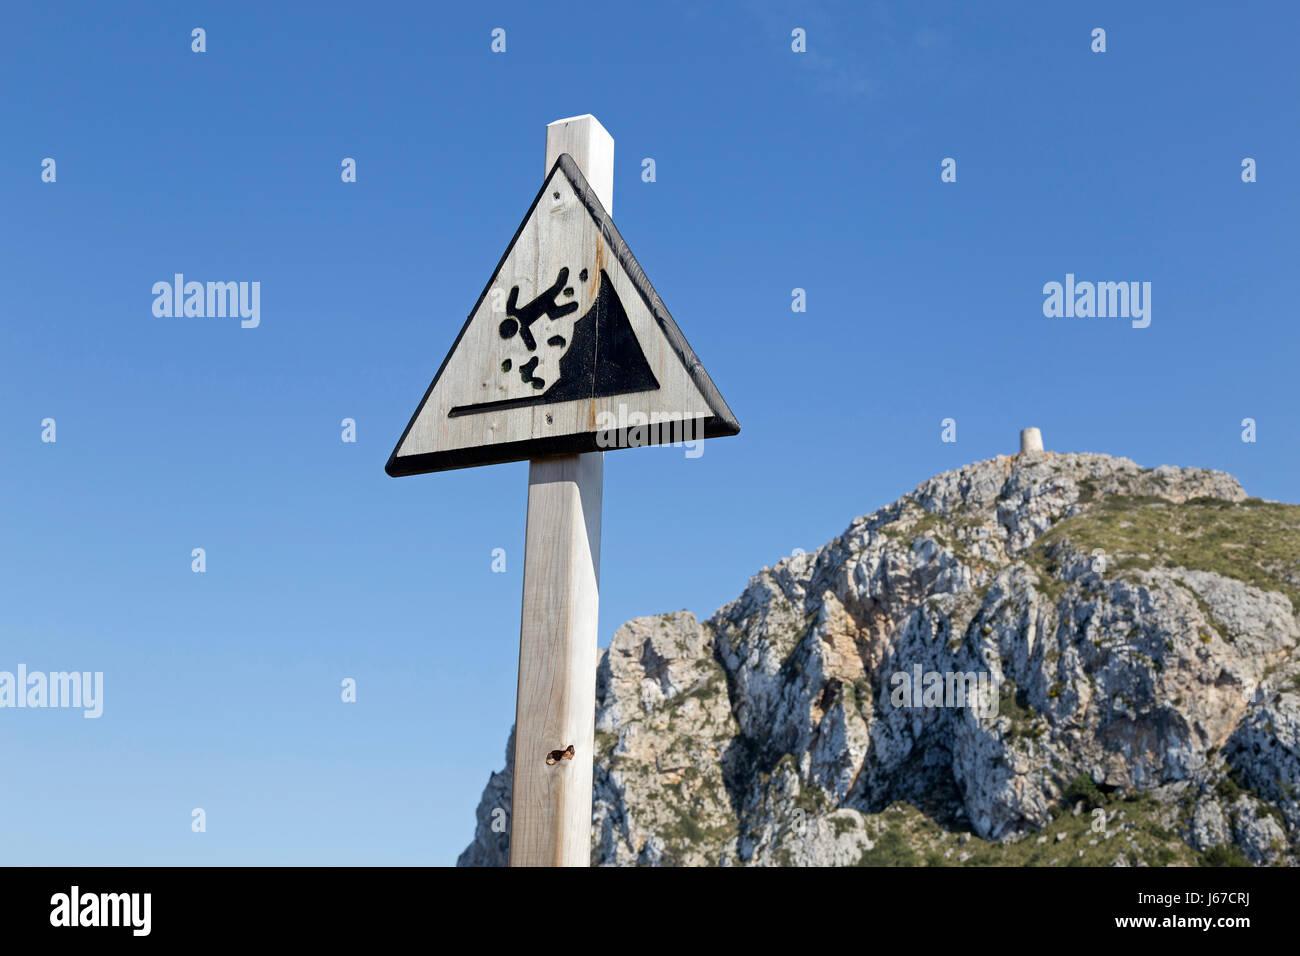 warning sign at the viewpoint mirador punta de la nao on Formentor Peninsula, Majorca, Spain Stock Photo